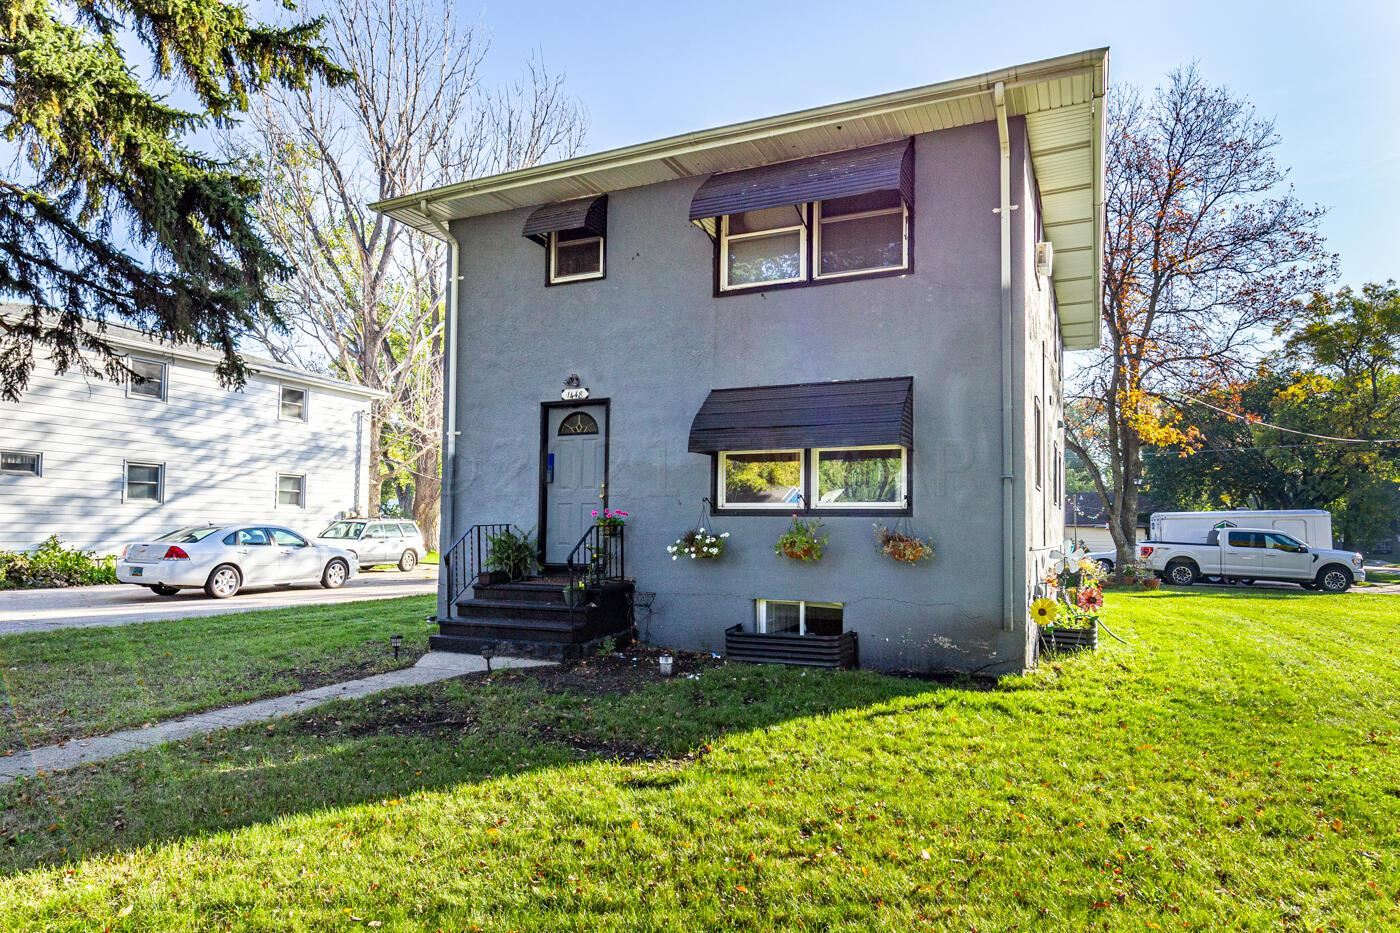 1448 15 Street S, Fargo, ND 58103 - #: 21-5474